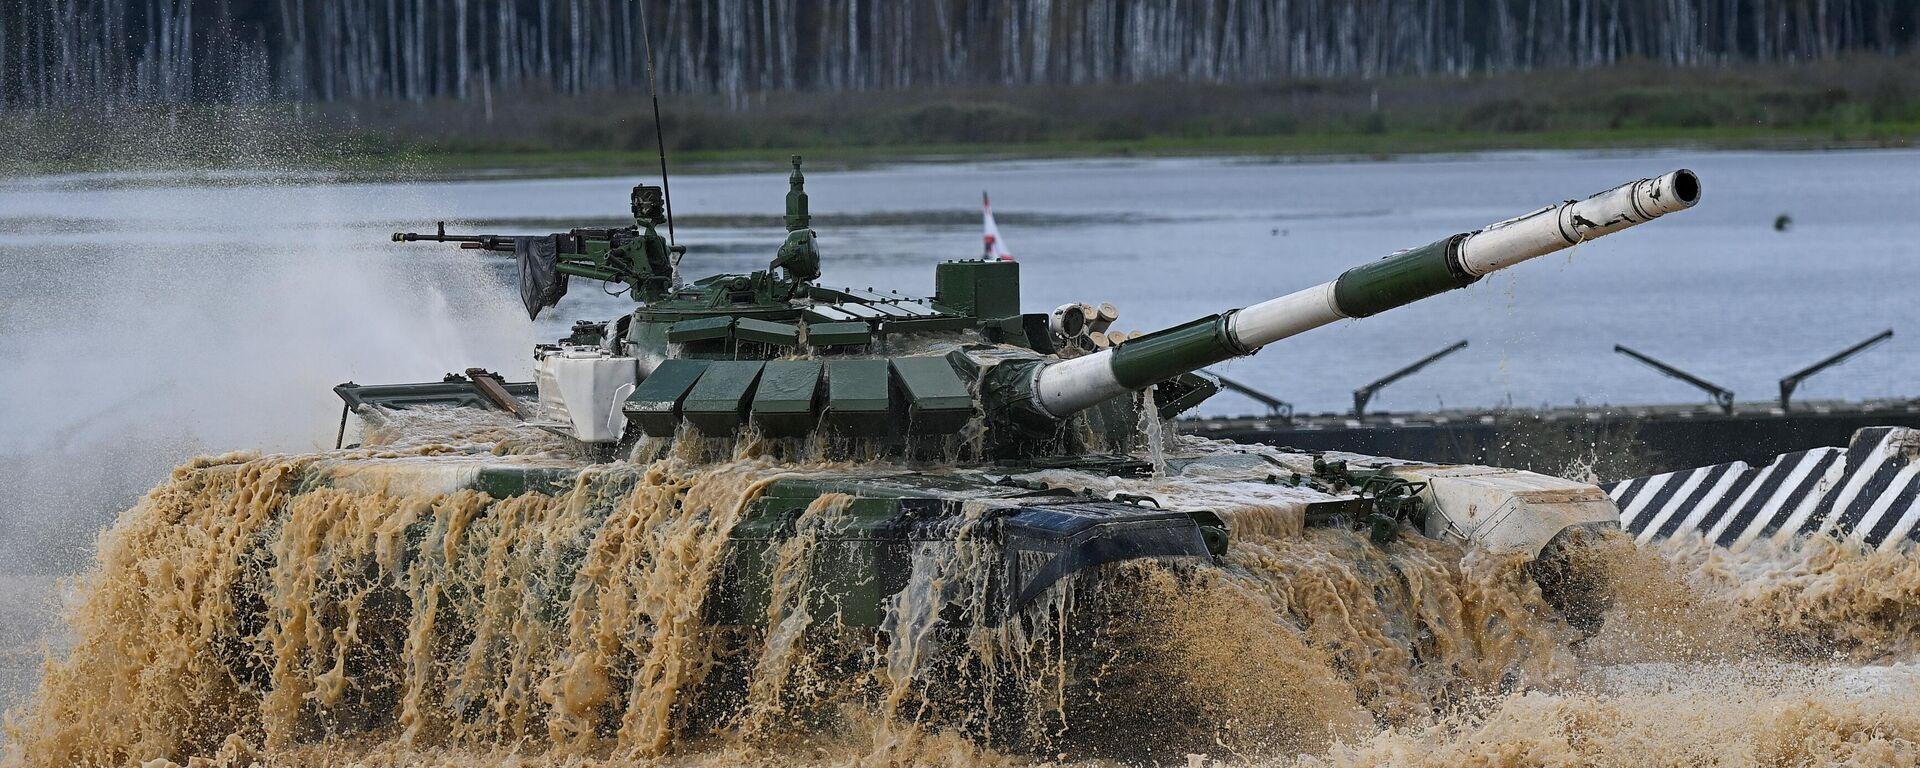 Танк Т-72Б3 команды военнослужащих Таджикистана - Sputnik Таджикистан, 1920, 24.08.2021